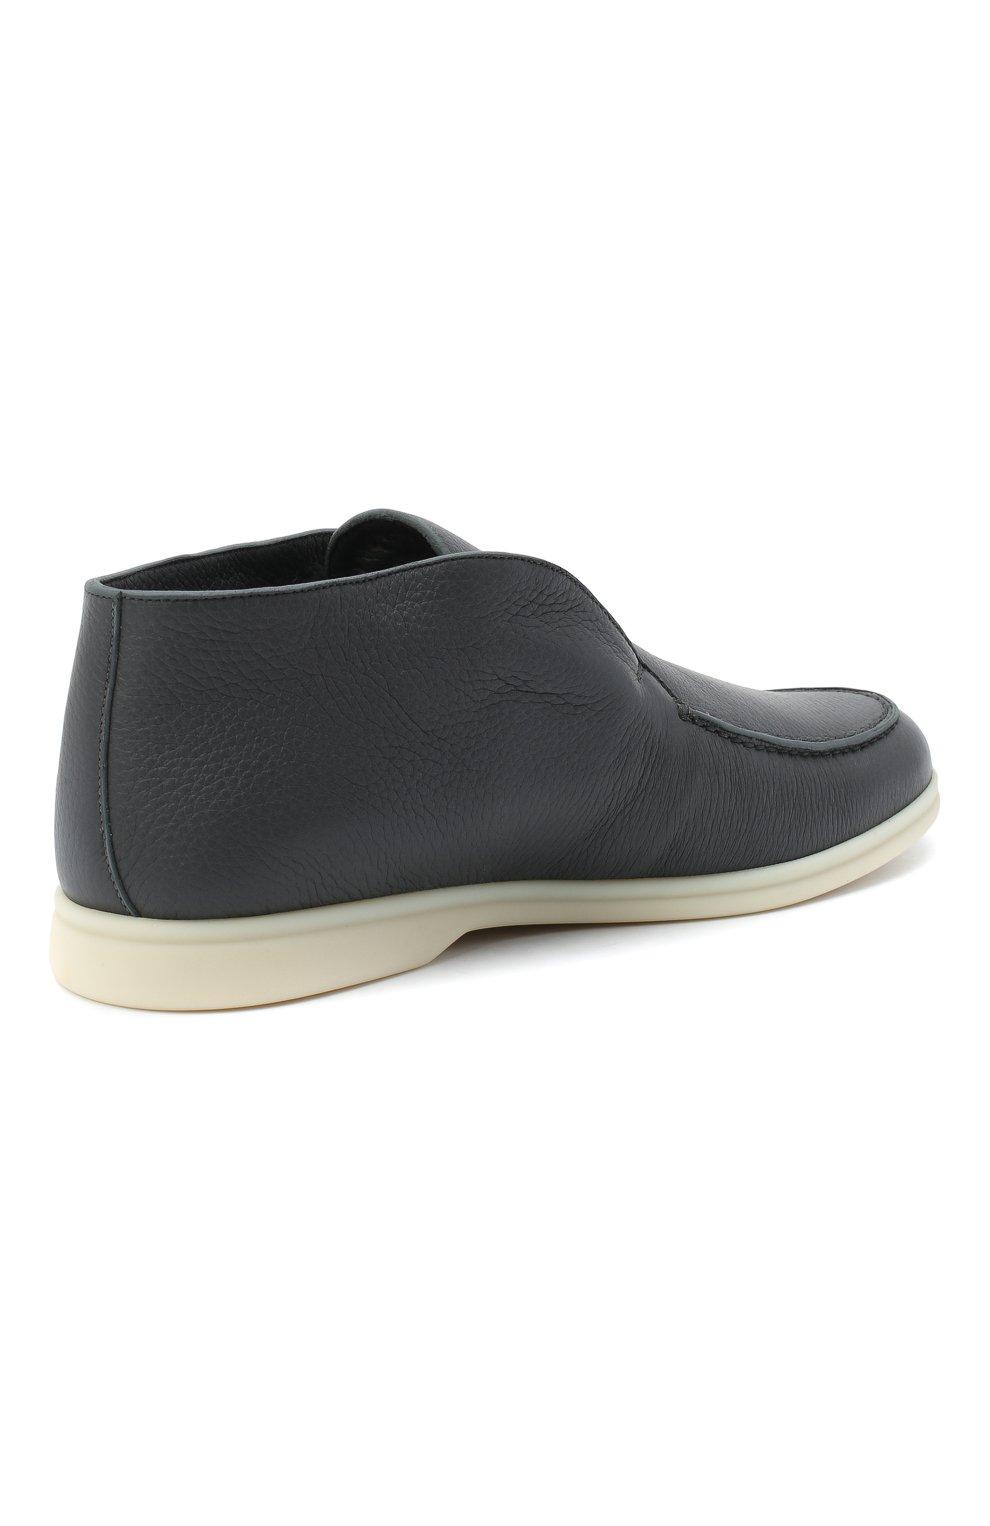 Мужские кожаные ботинки open walk LORO PIANA темно-серого цвета, арт. FAI3276 | Фото 4